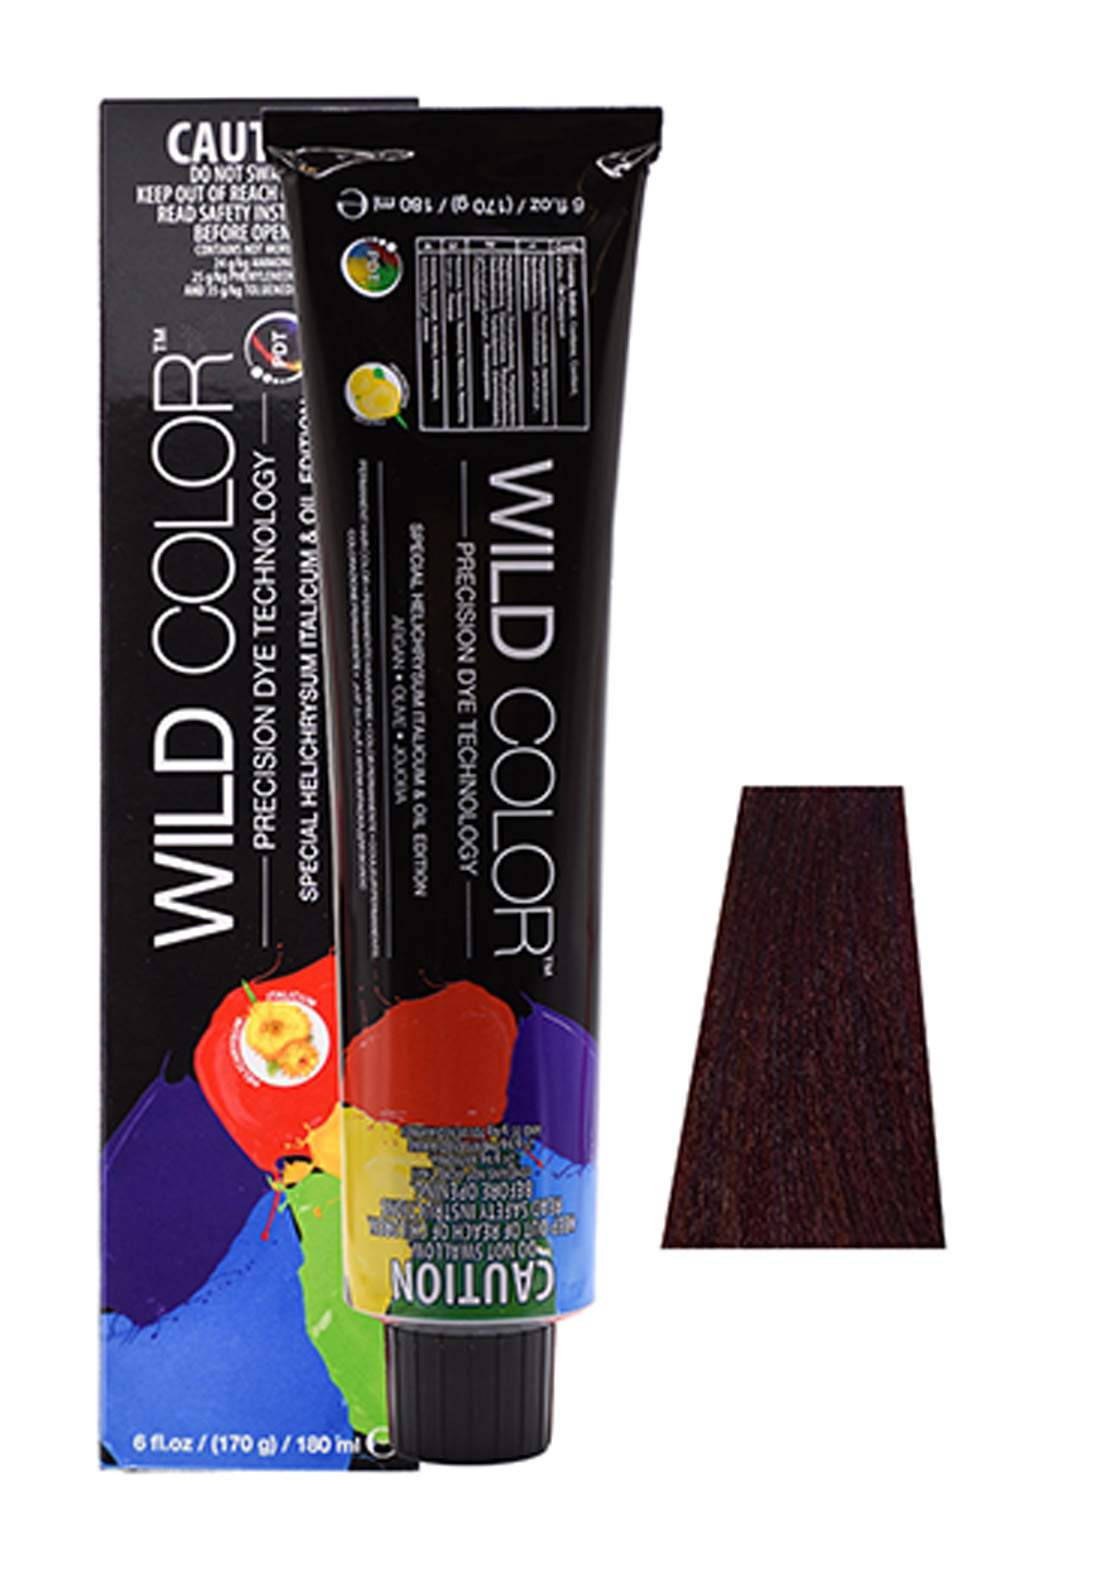 Wild Color Hair Color Cream 6.5  6M - Dark Mahogany Blond صبغة شعر